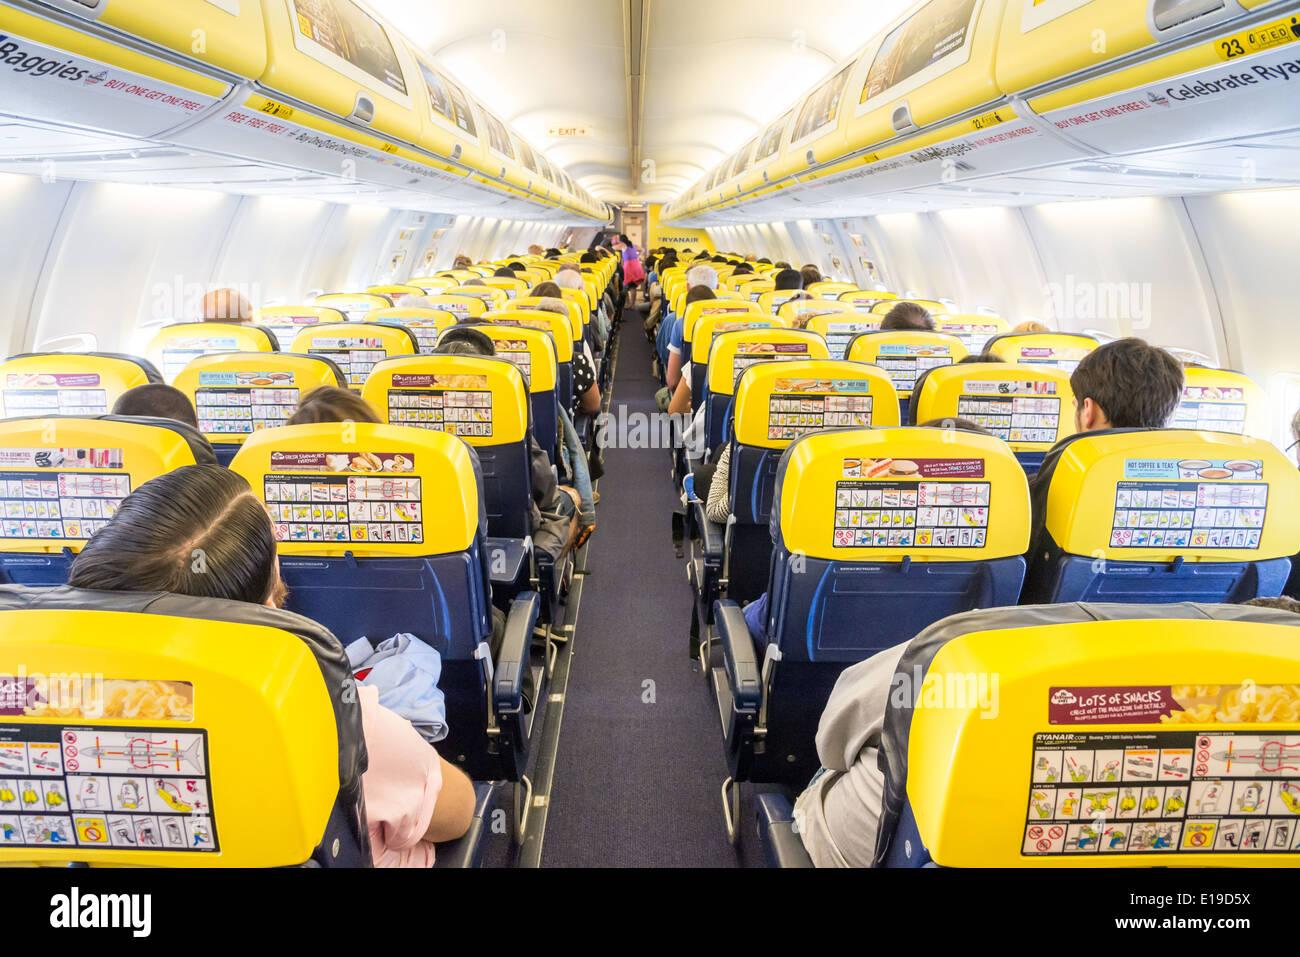 On board a Ryanair flight, England, UK - Stock Image